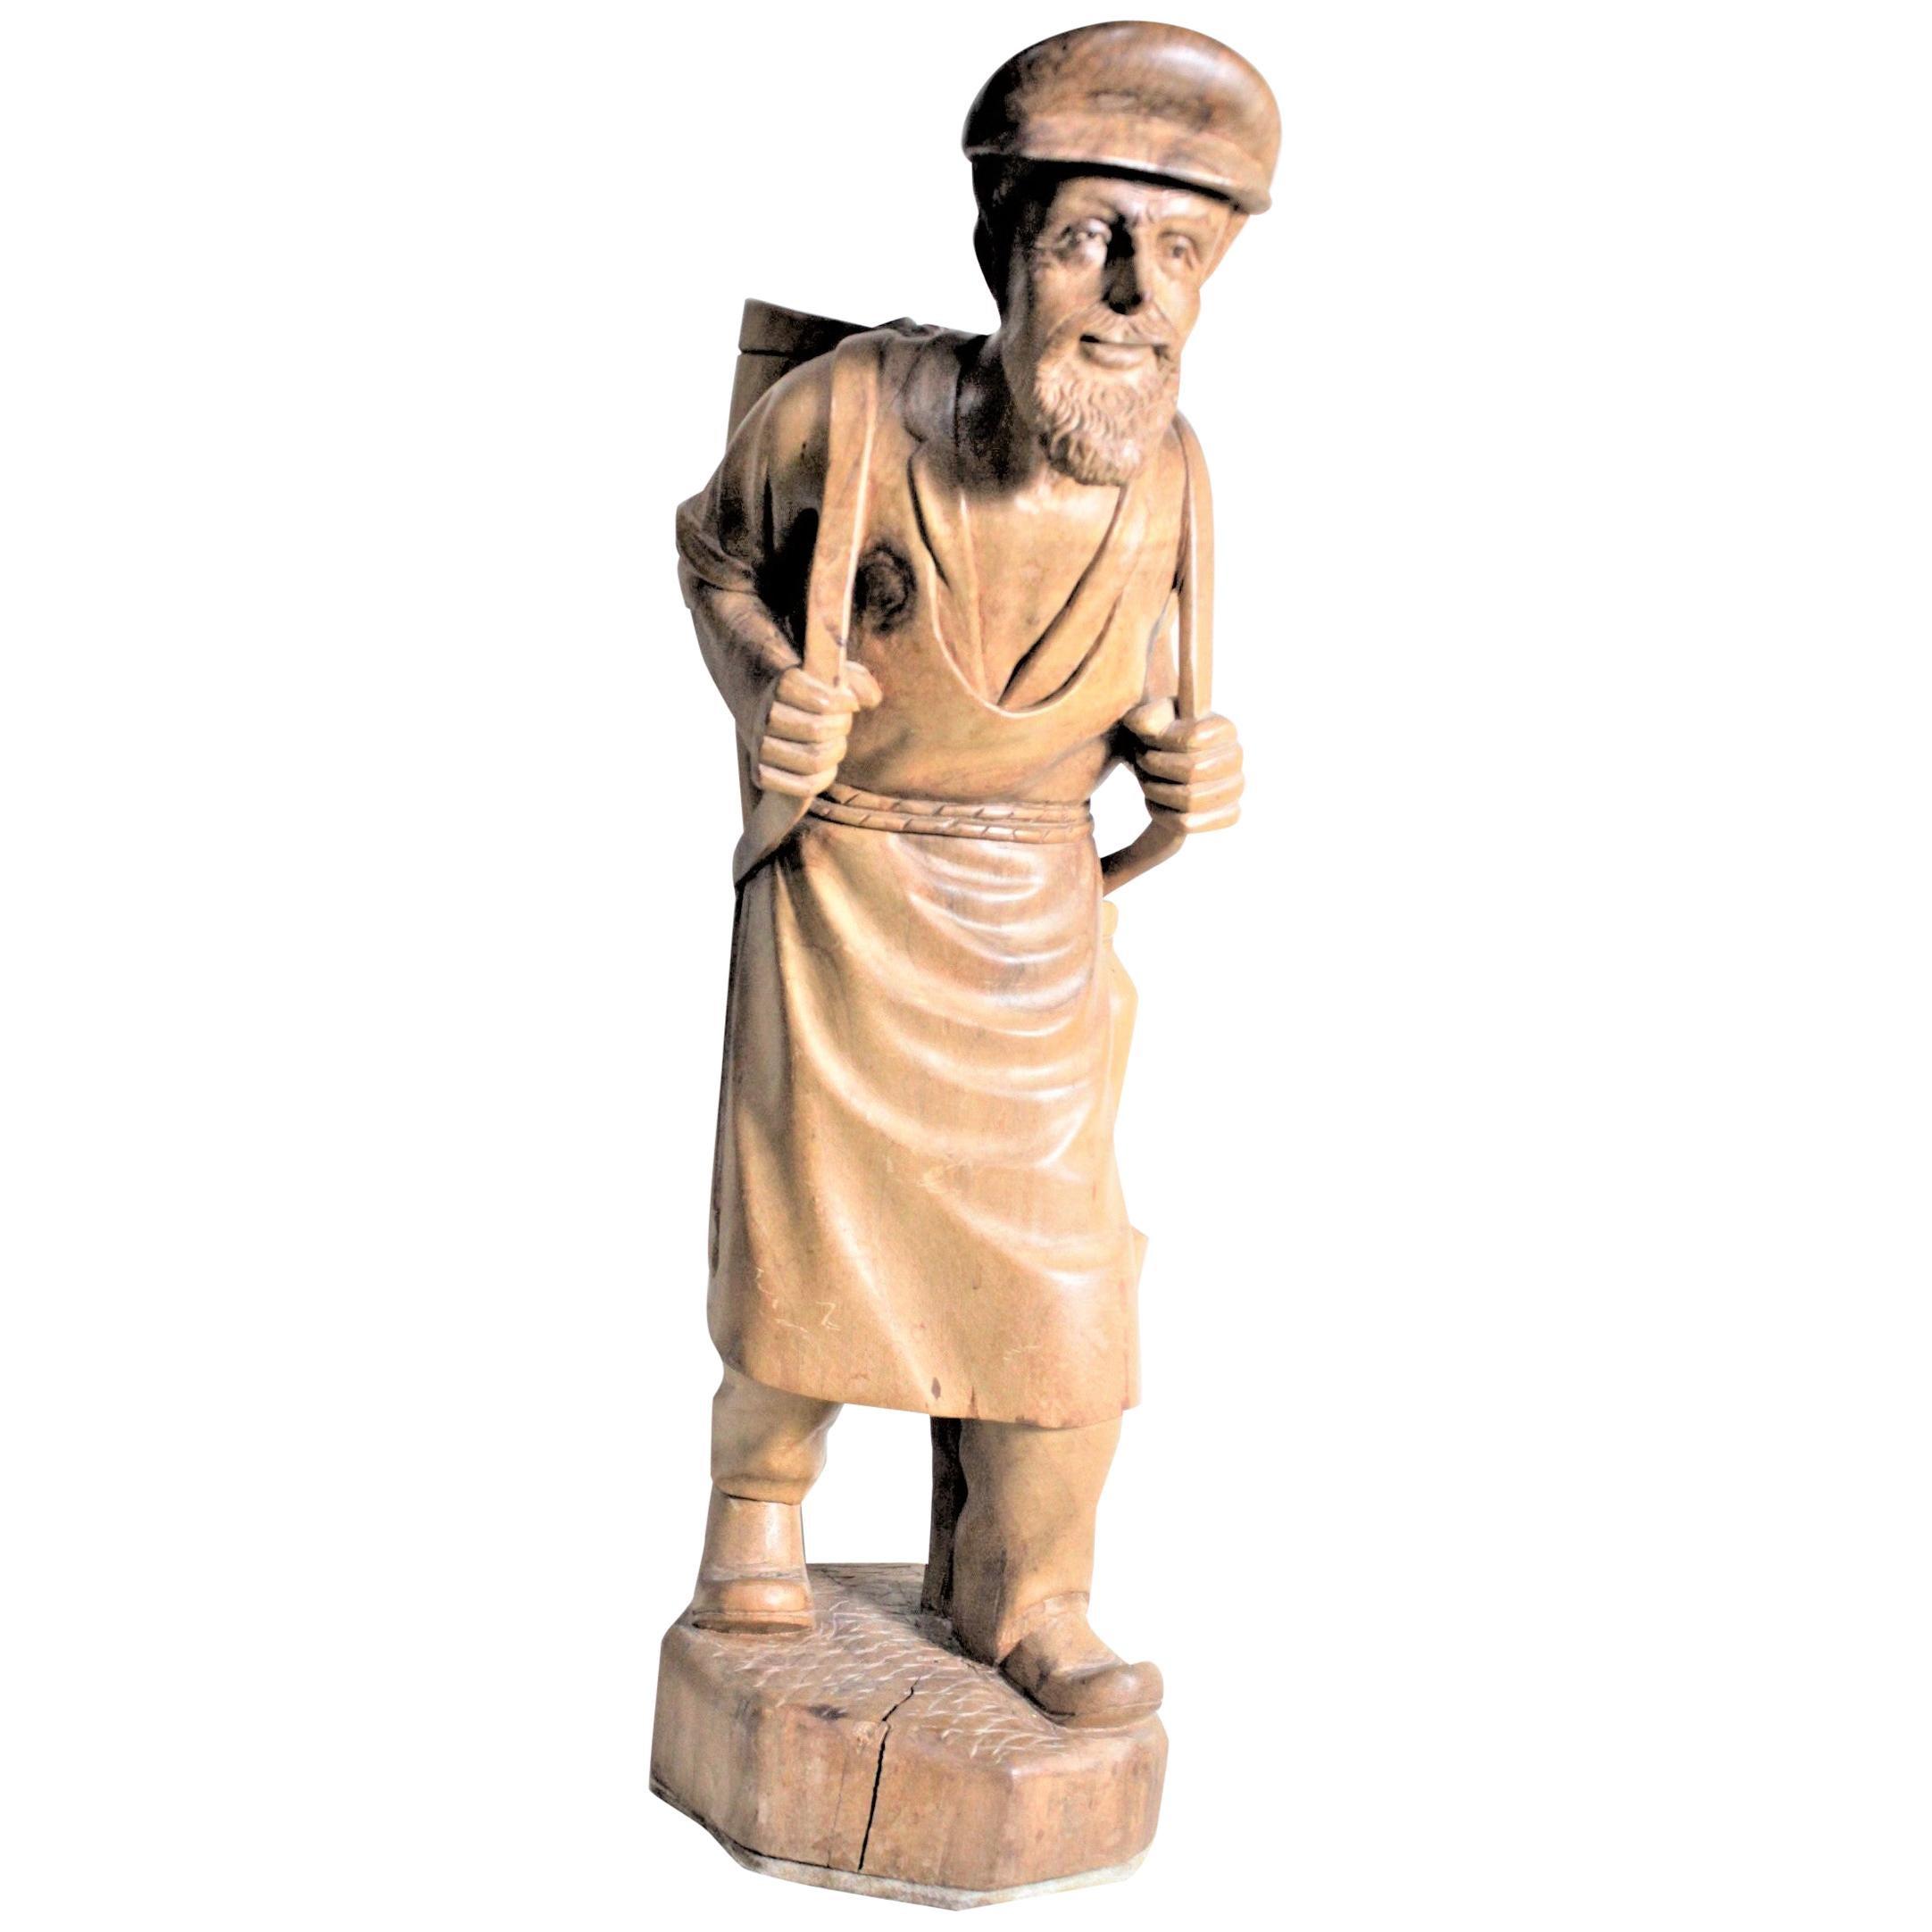 Large European Folk Art Carved Wooden Standing Man Carrying a Basket Sculpture